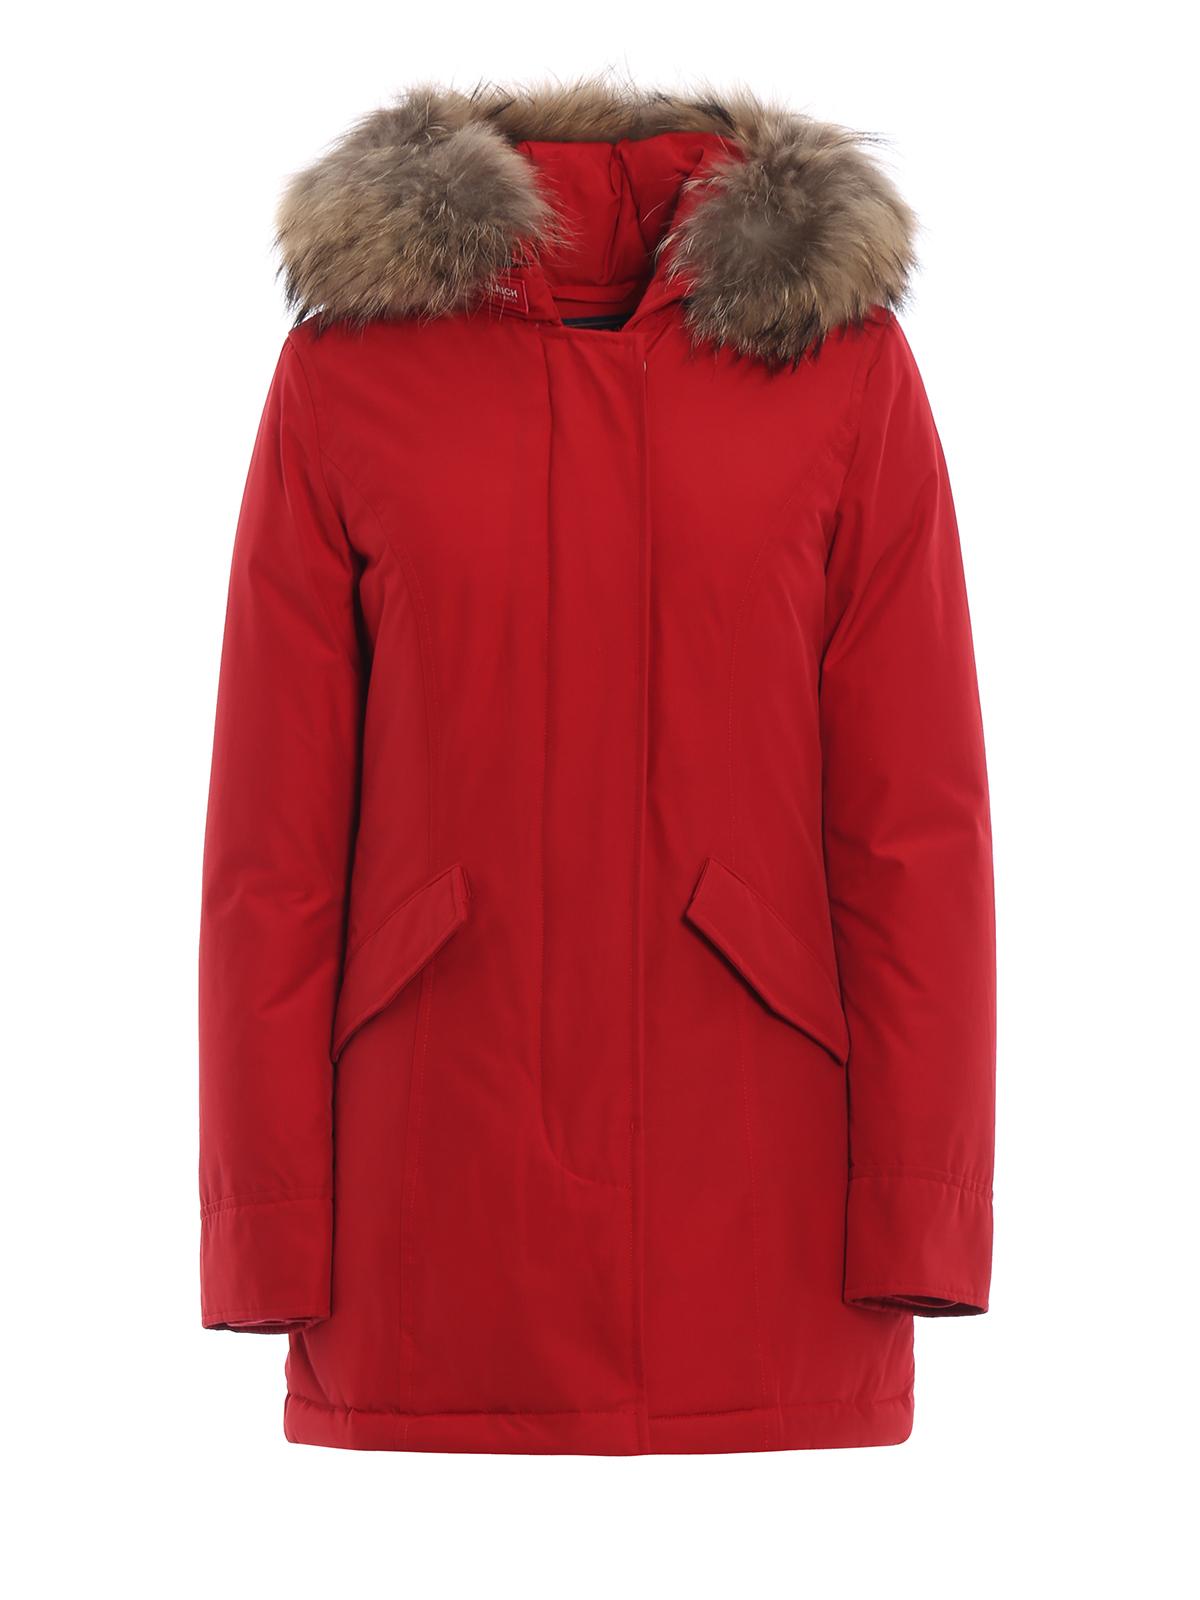 Parka Rosso Imbottiti Cappotti Woolrich Arctic Piumino 84BqHxOw